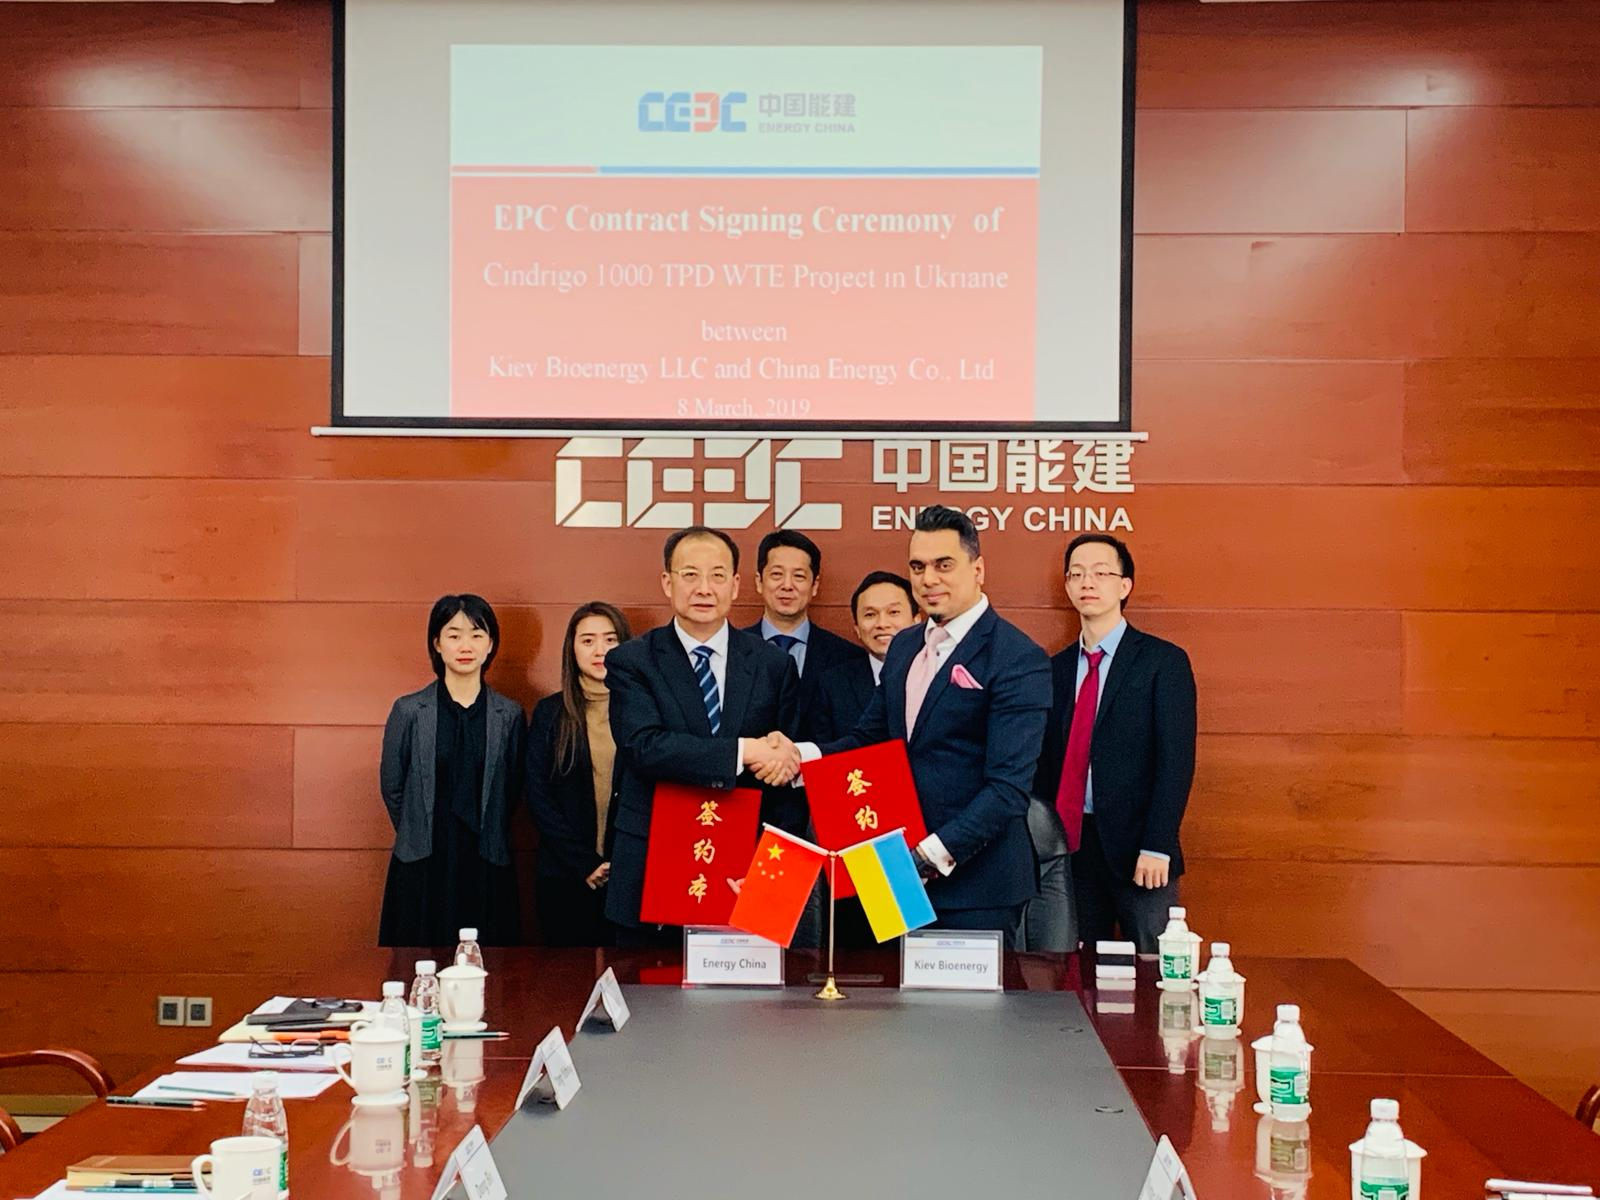 EPC contract signing between Cindrigo and China Energi